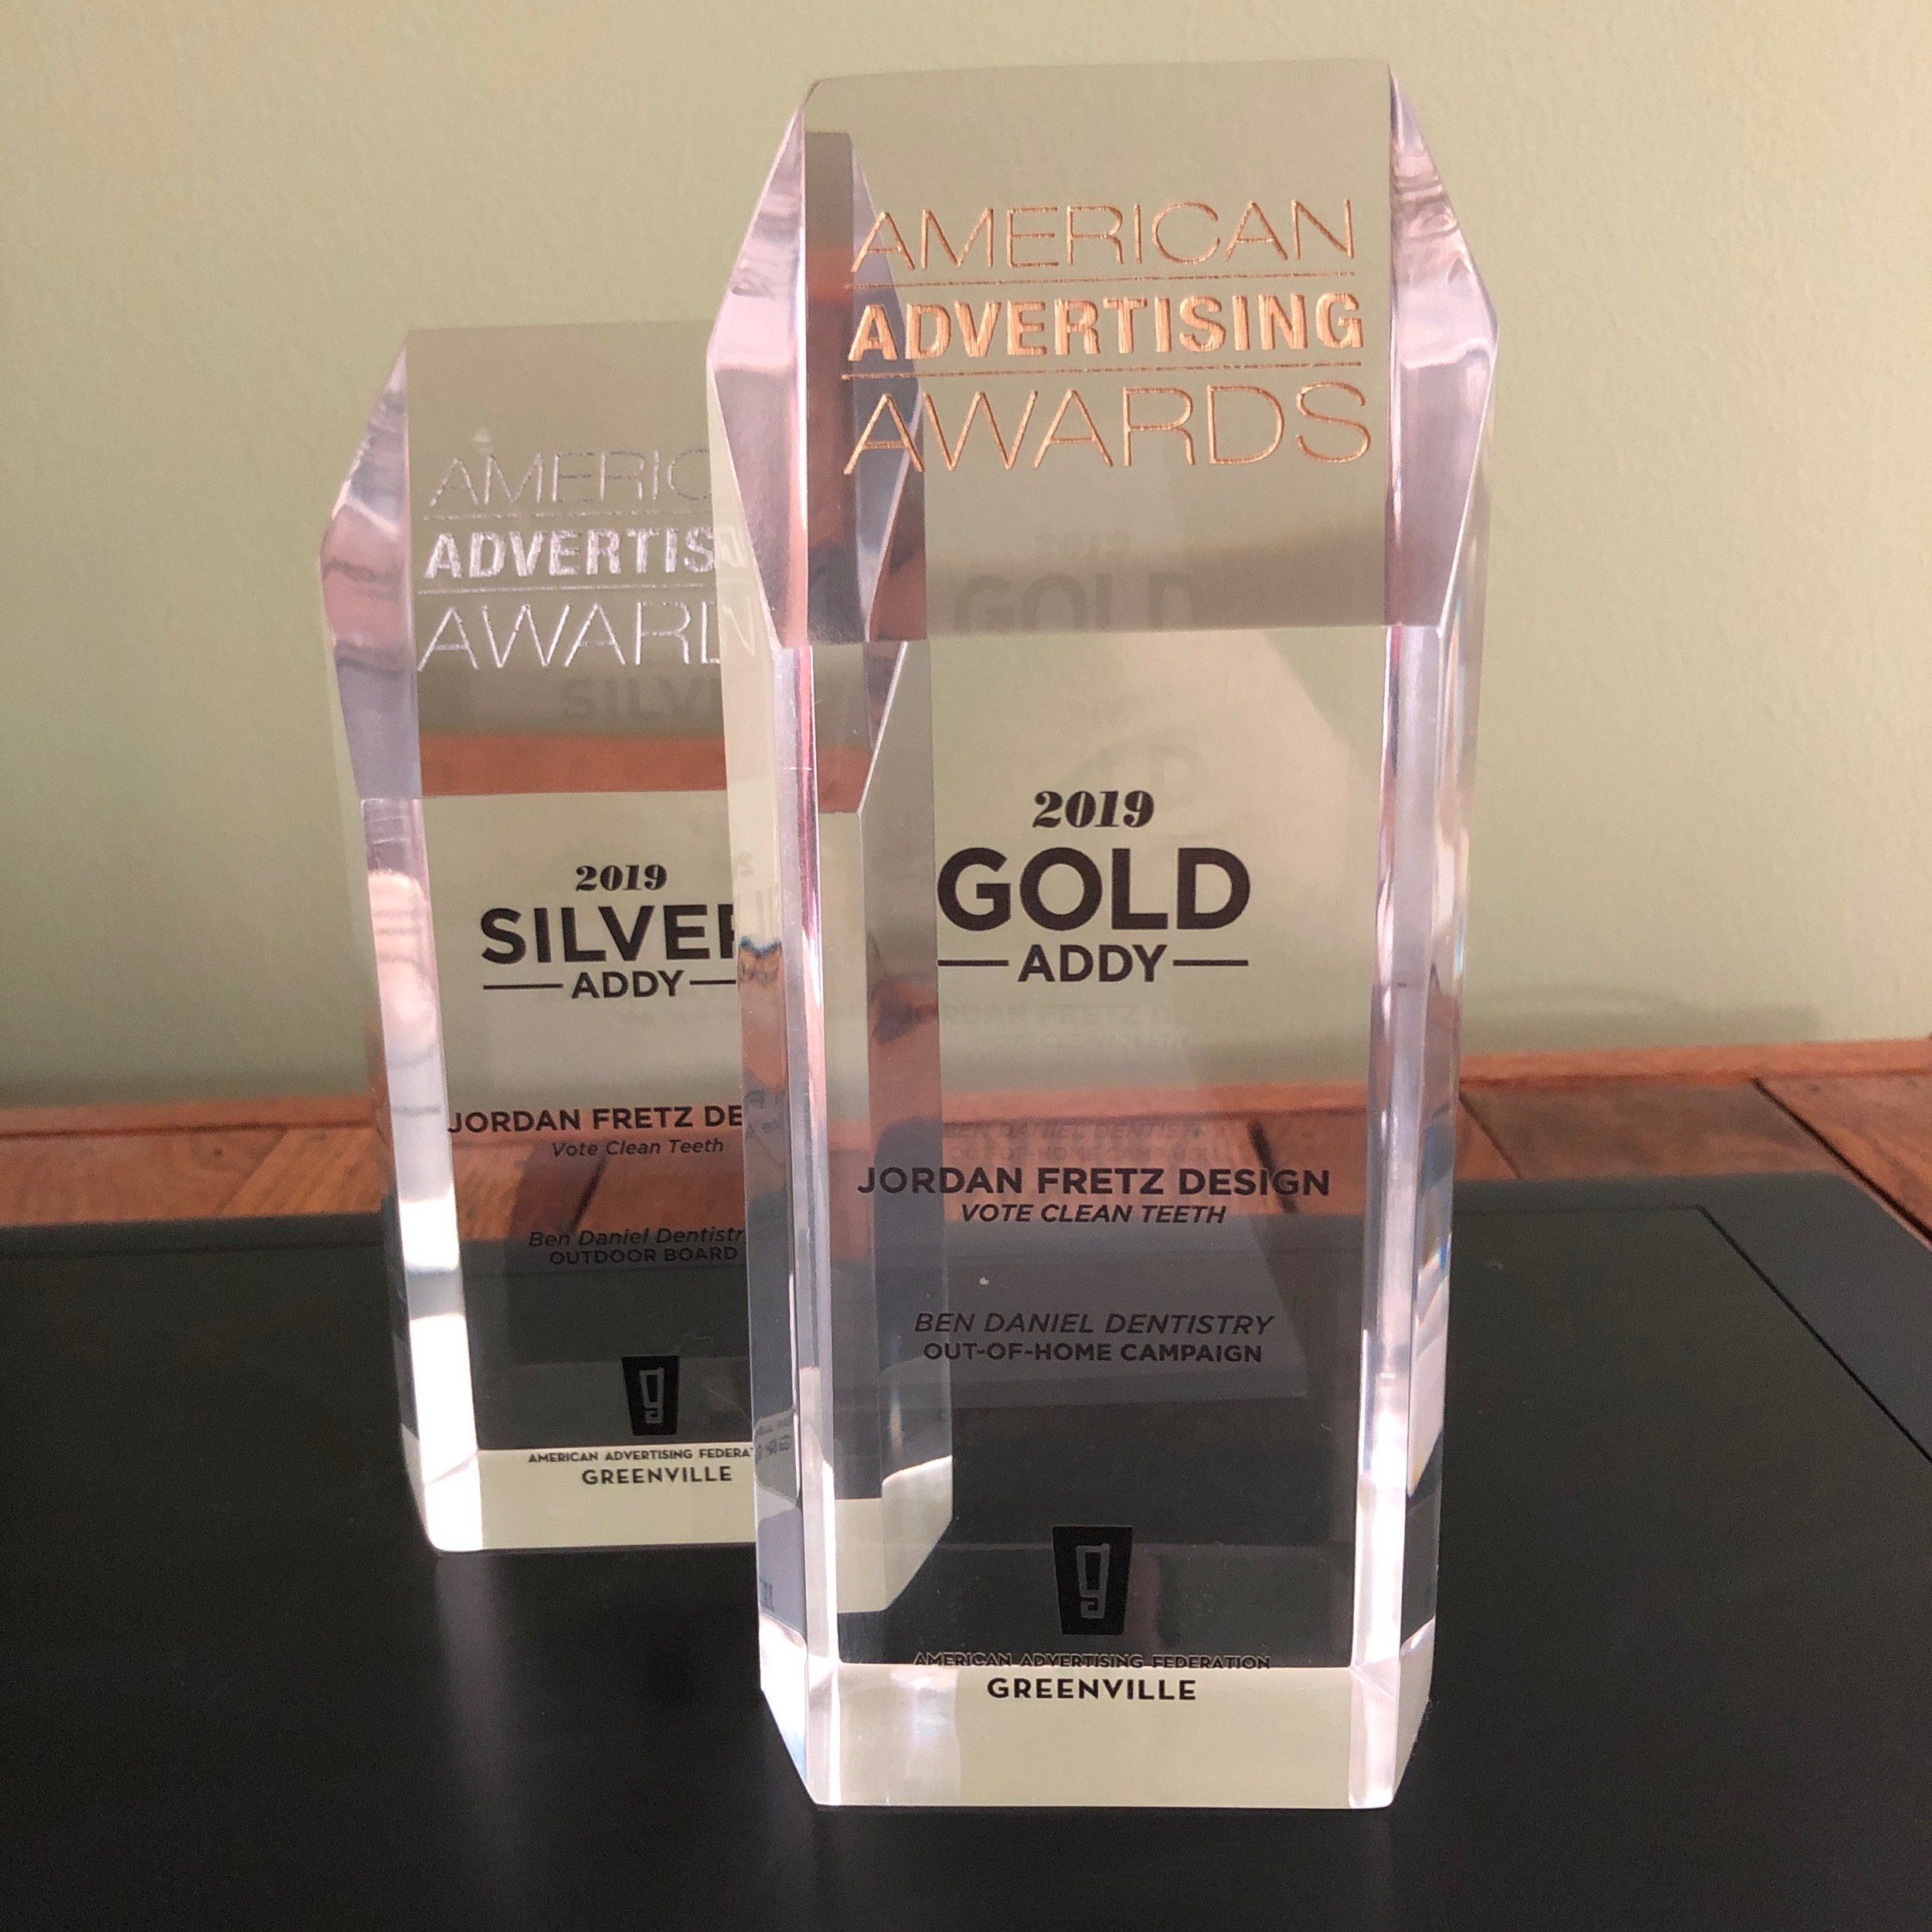 jordan-fretz-addy-awards-greenville-4.jpg